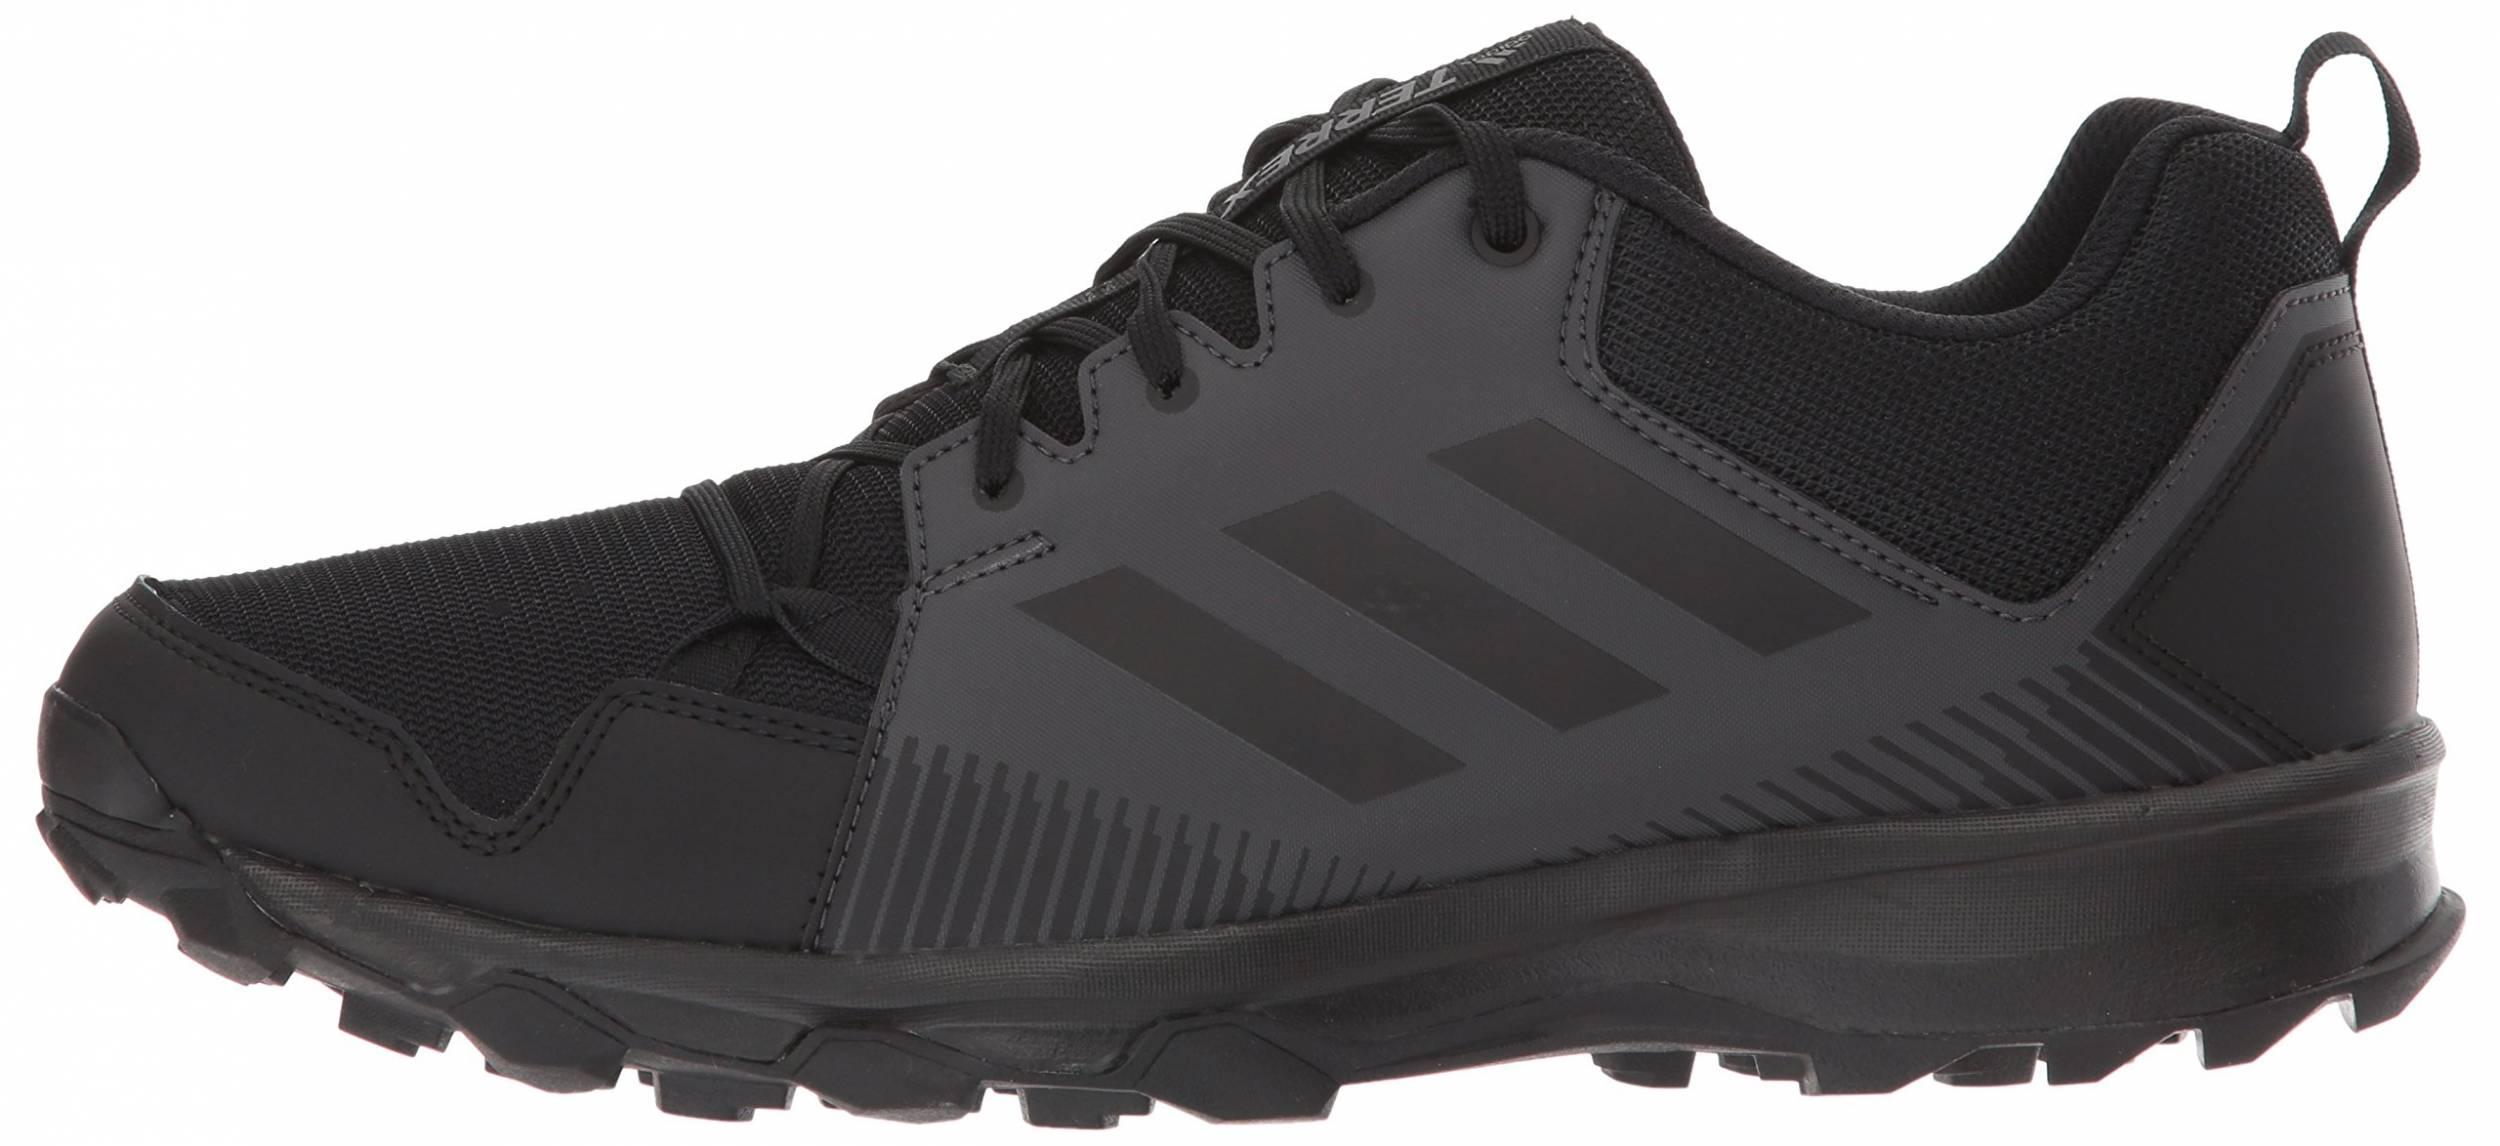 30 Adidas trail running shoes - Save 48% | RunRepeat